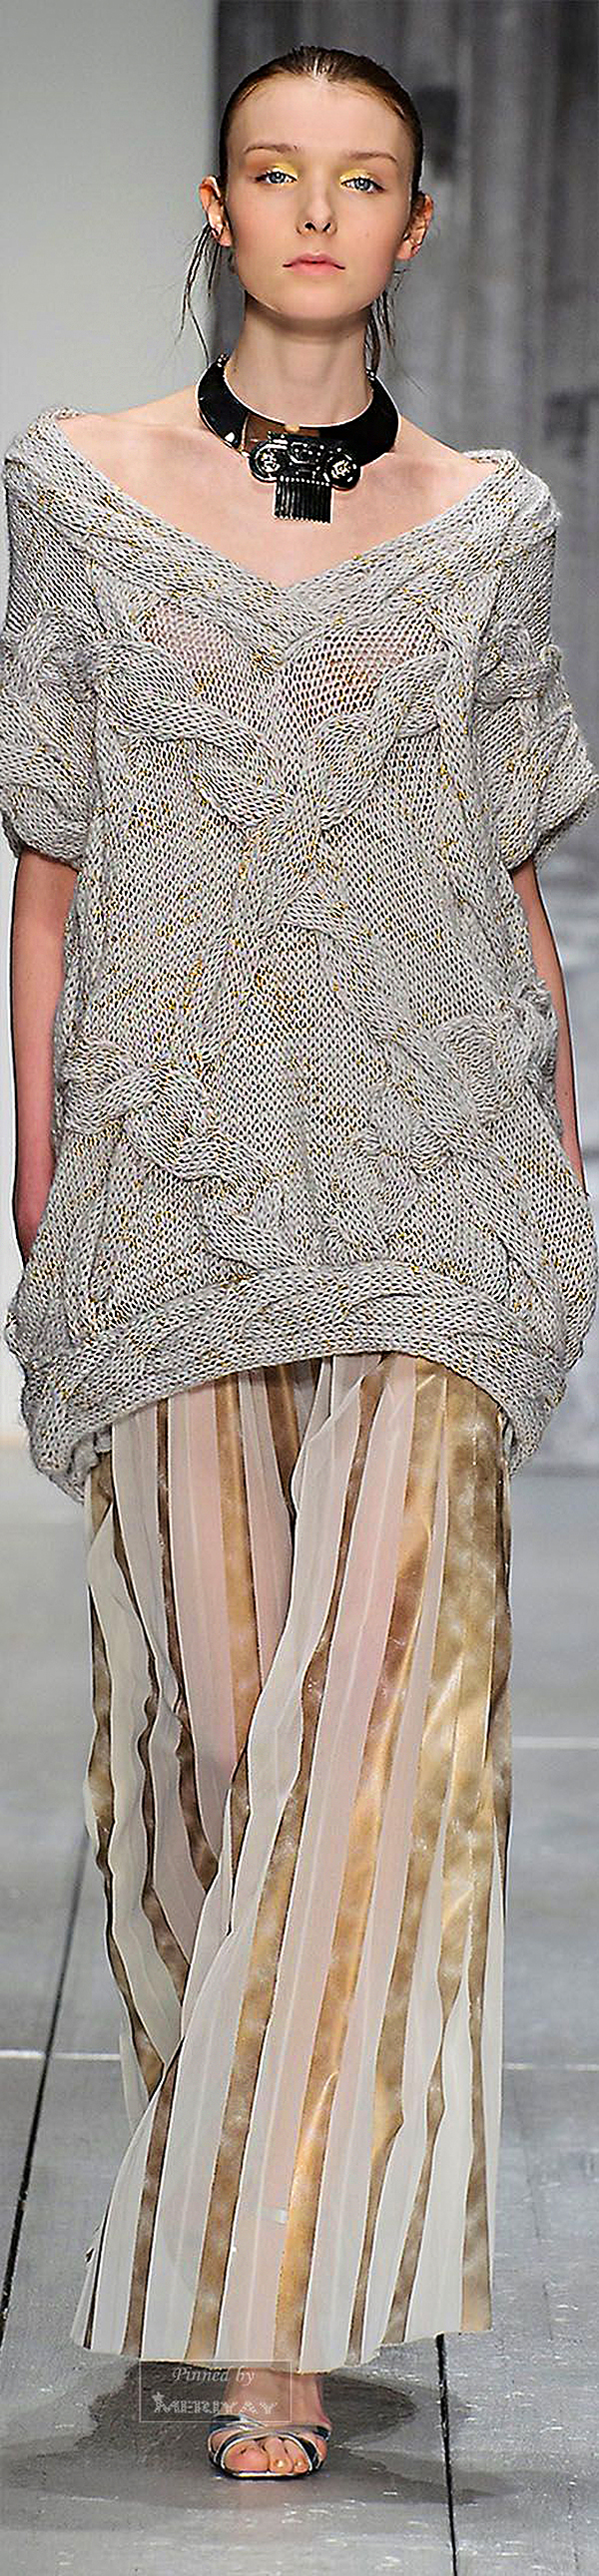 Вязание лаура бьяджотти